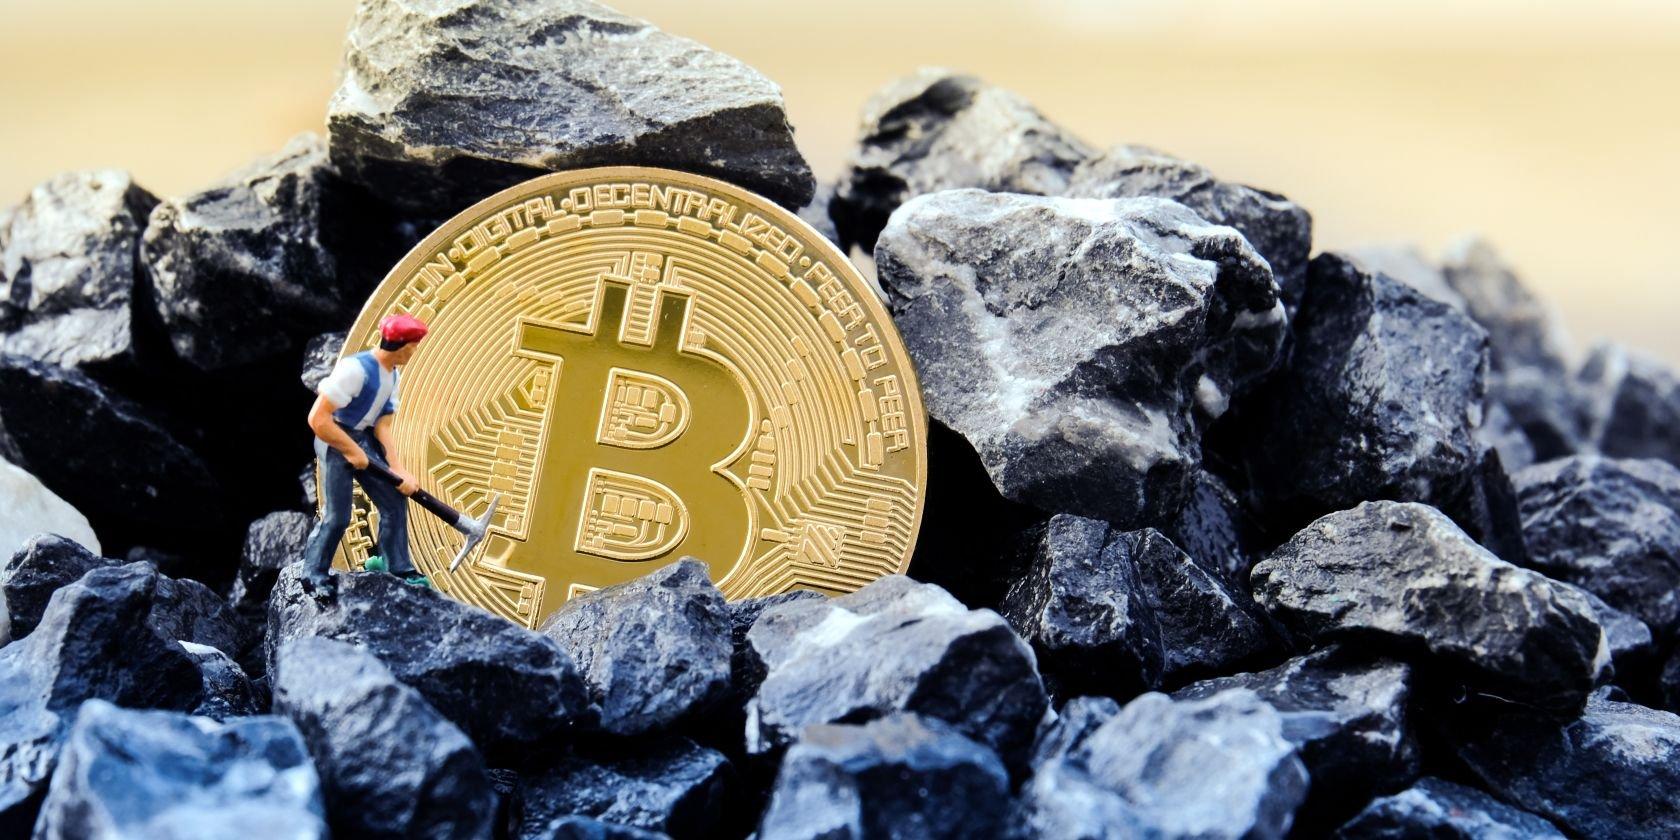 How to Mine Bitcoins